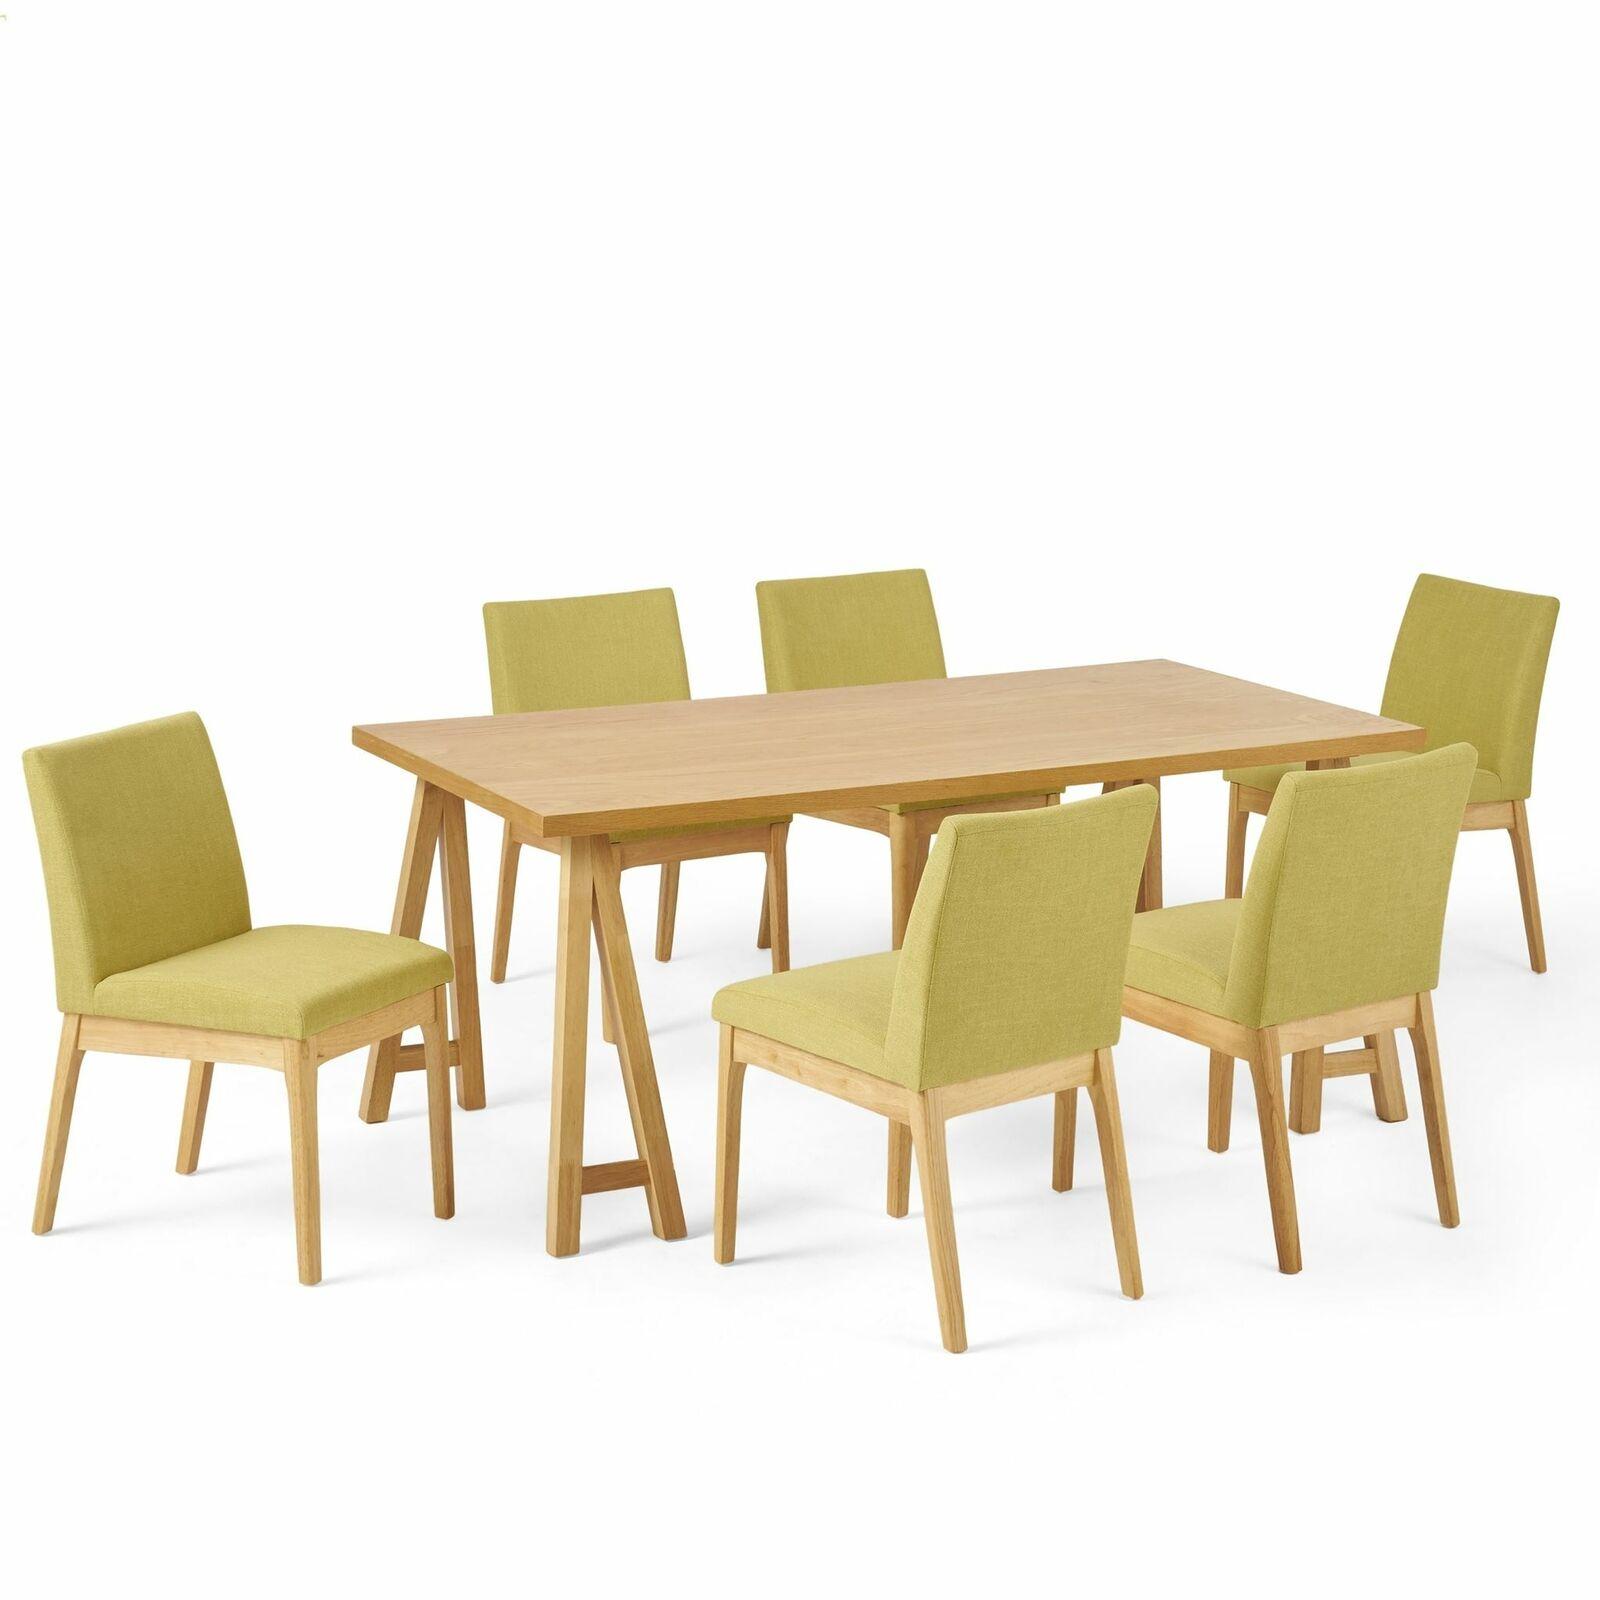 Elsinore Mid-Century Modern 7 Piece Dining Set Dining Sets